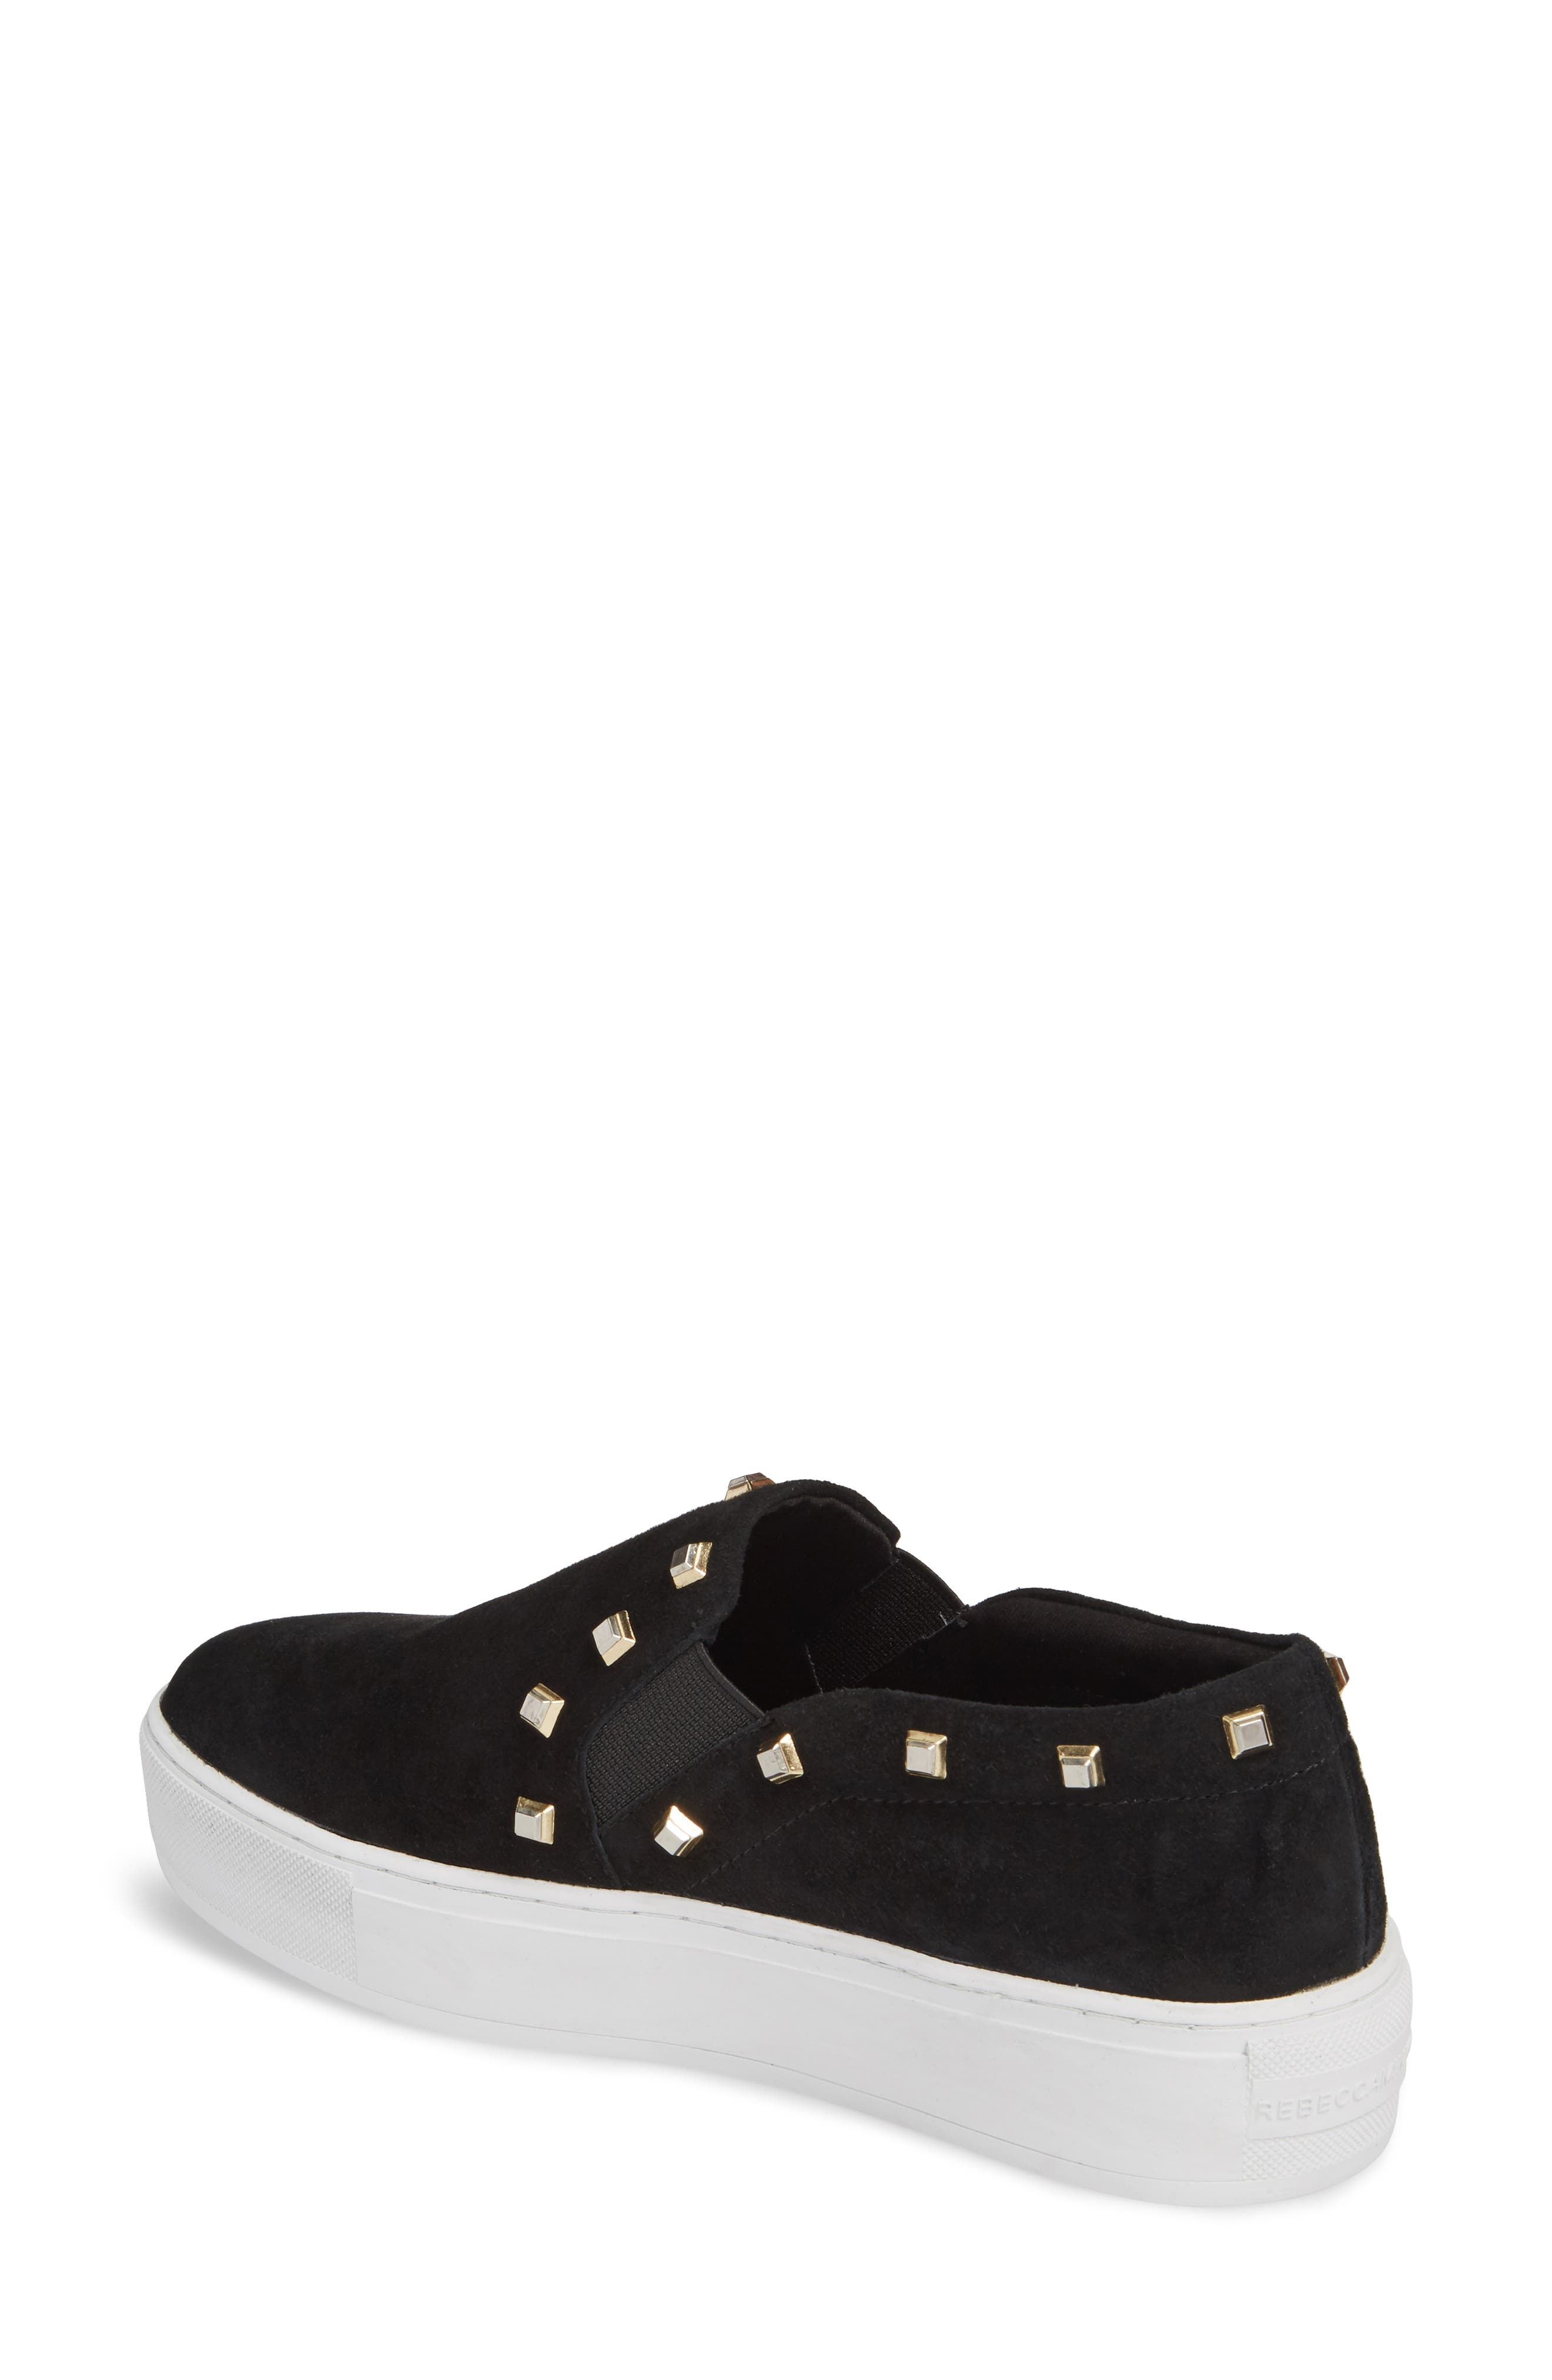 Nora Stud Platform Sneaker,                             Alternate thumbnail 2, color,                             Black Suede